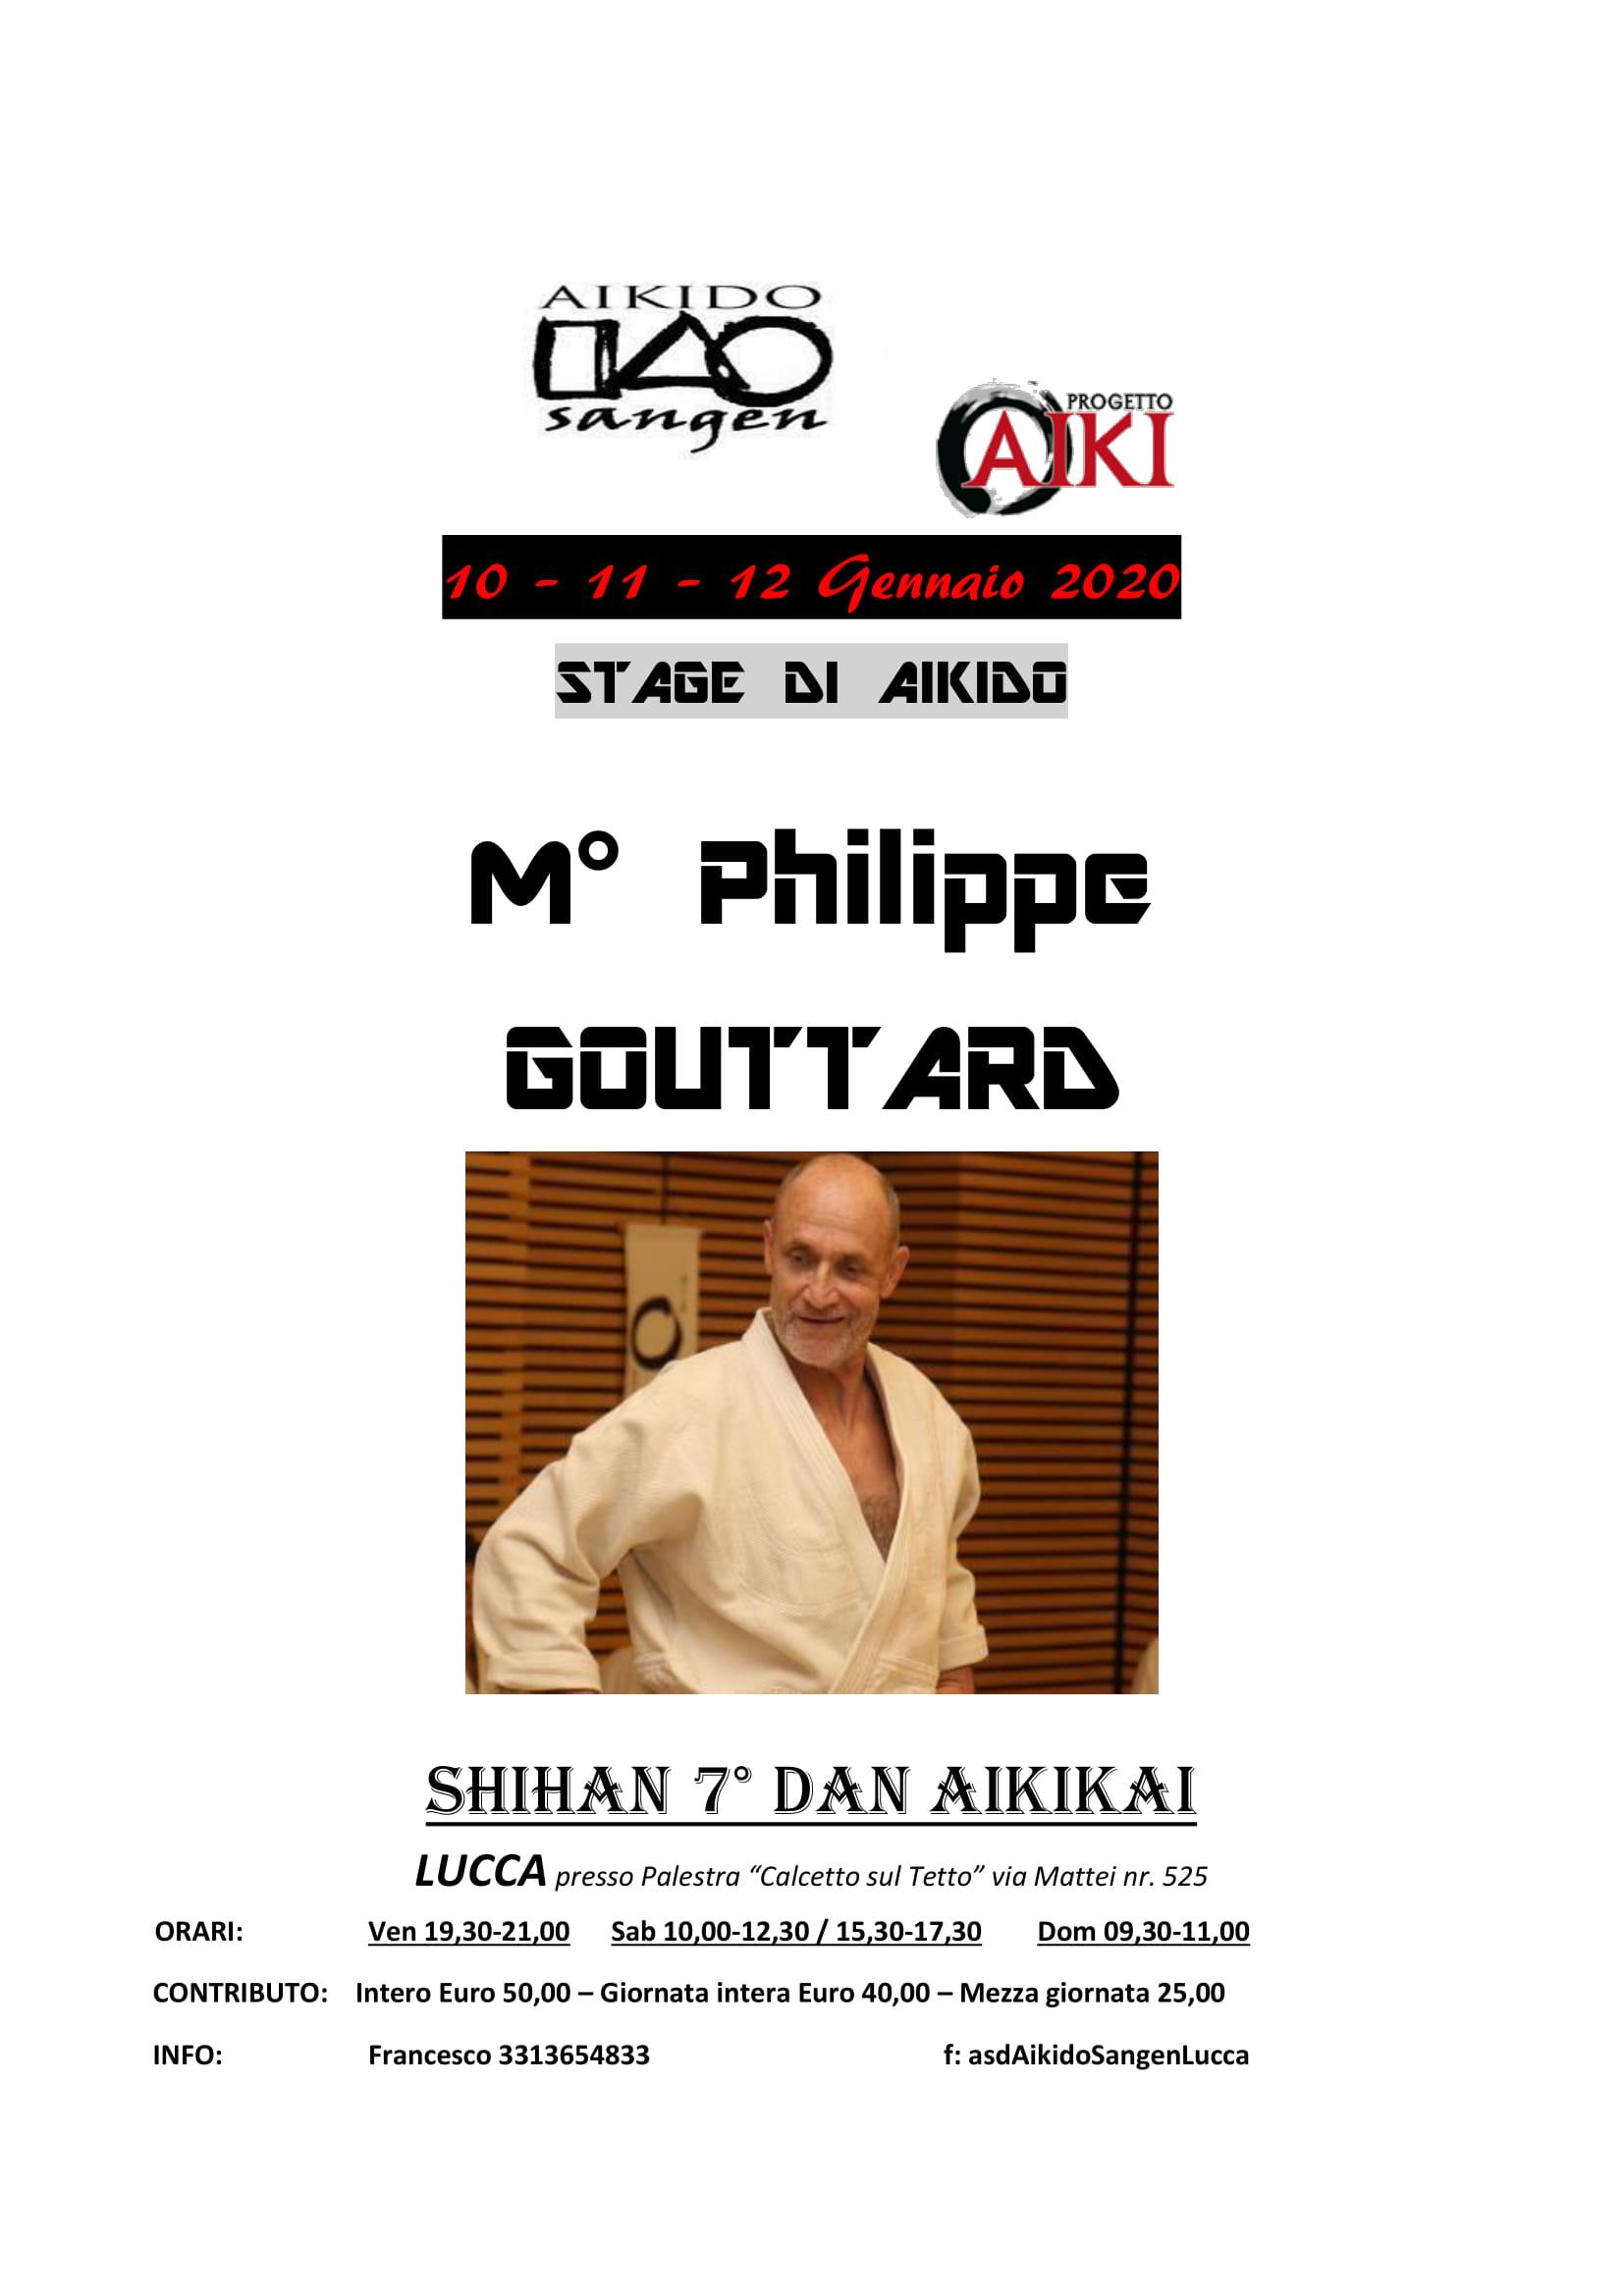 10-11-120 GENN 2020 Stage di Aikido - Philippe Gouttard - Lucca